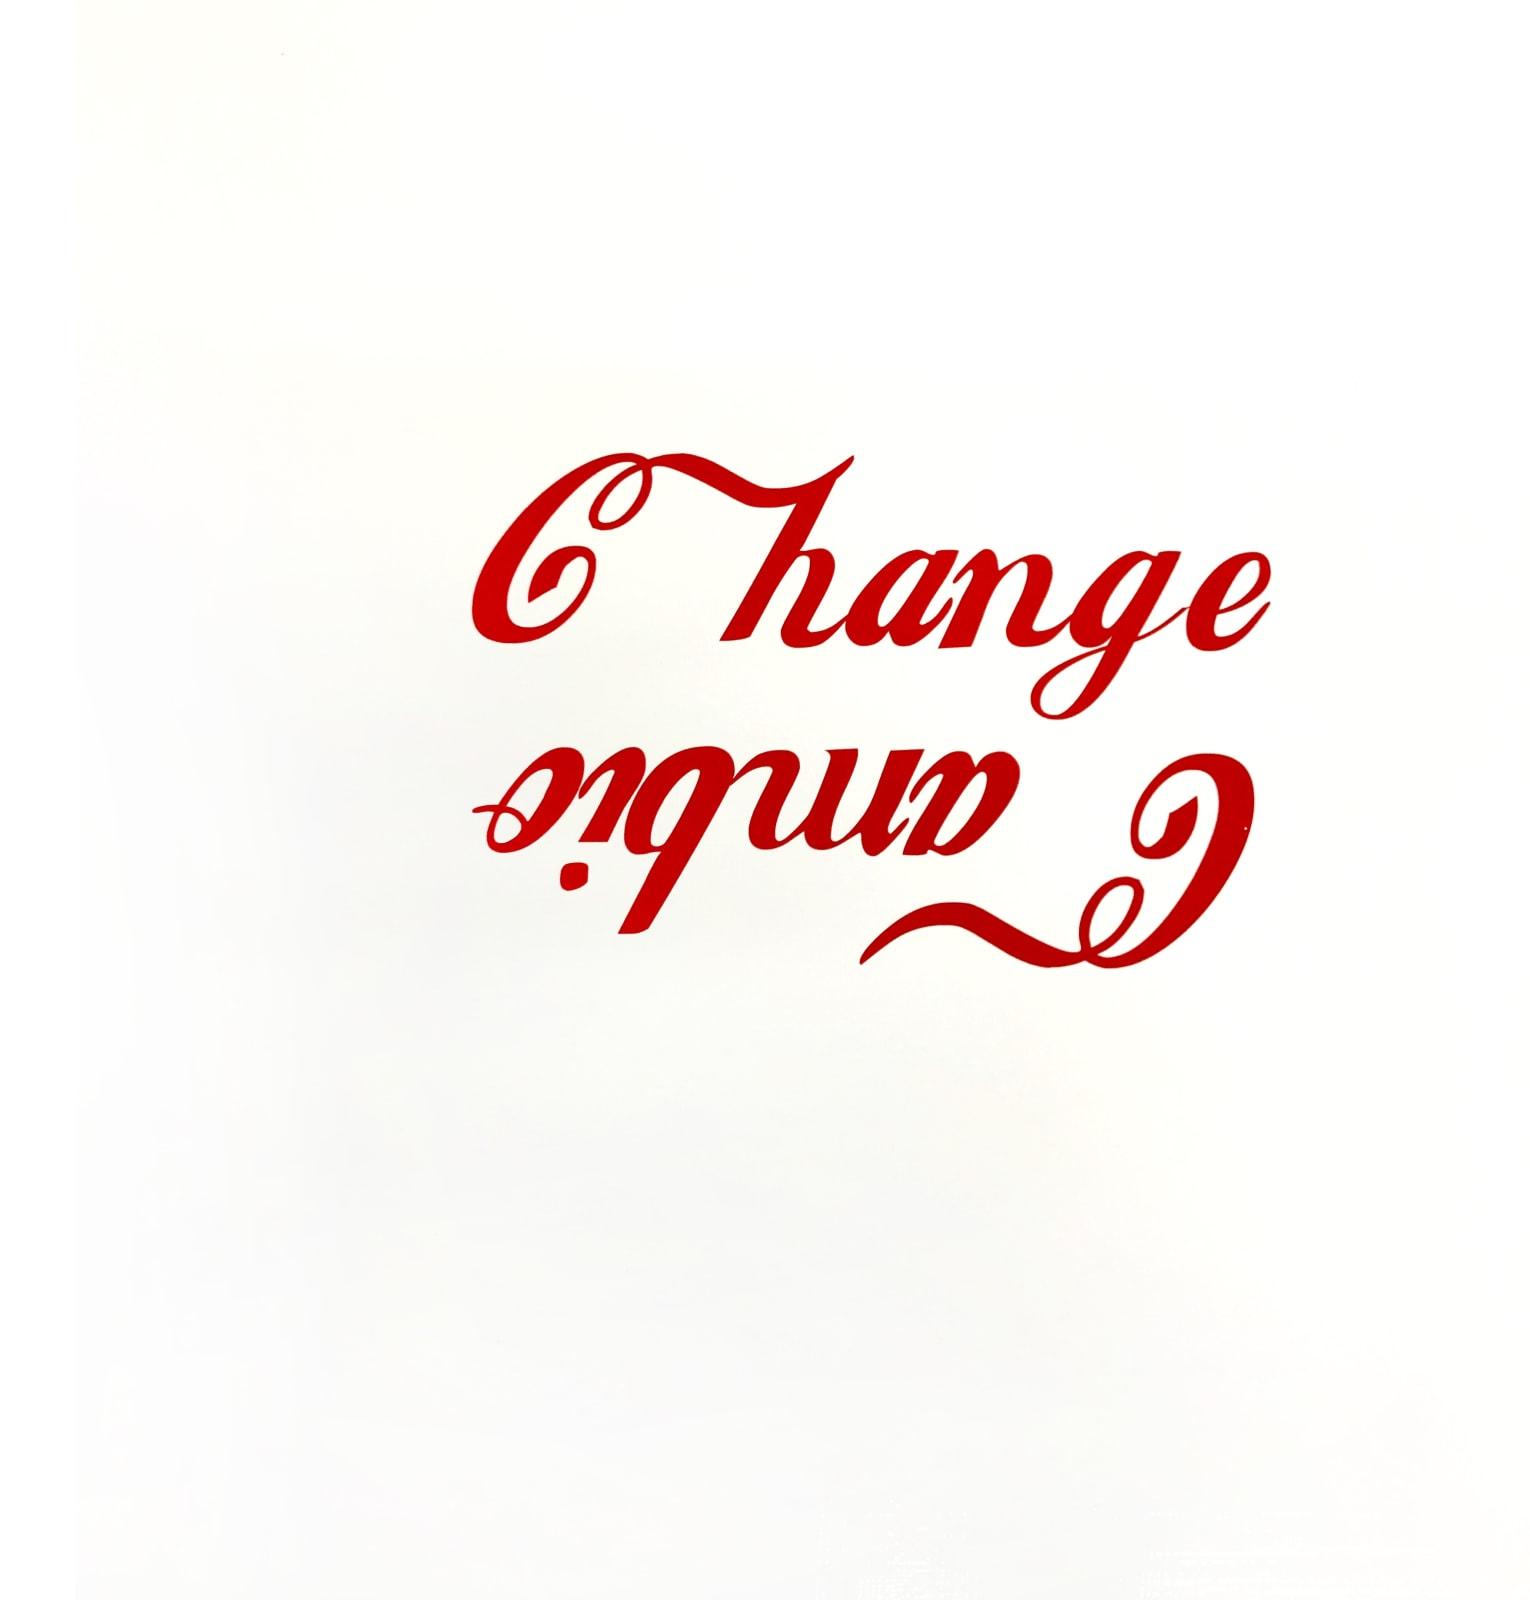 Ethel Shipton Change Cambio, 2020 House paint, vinyl on panel, 24 x 24